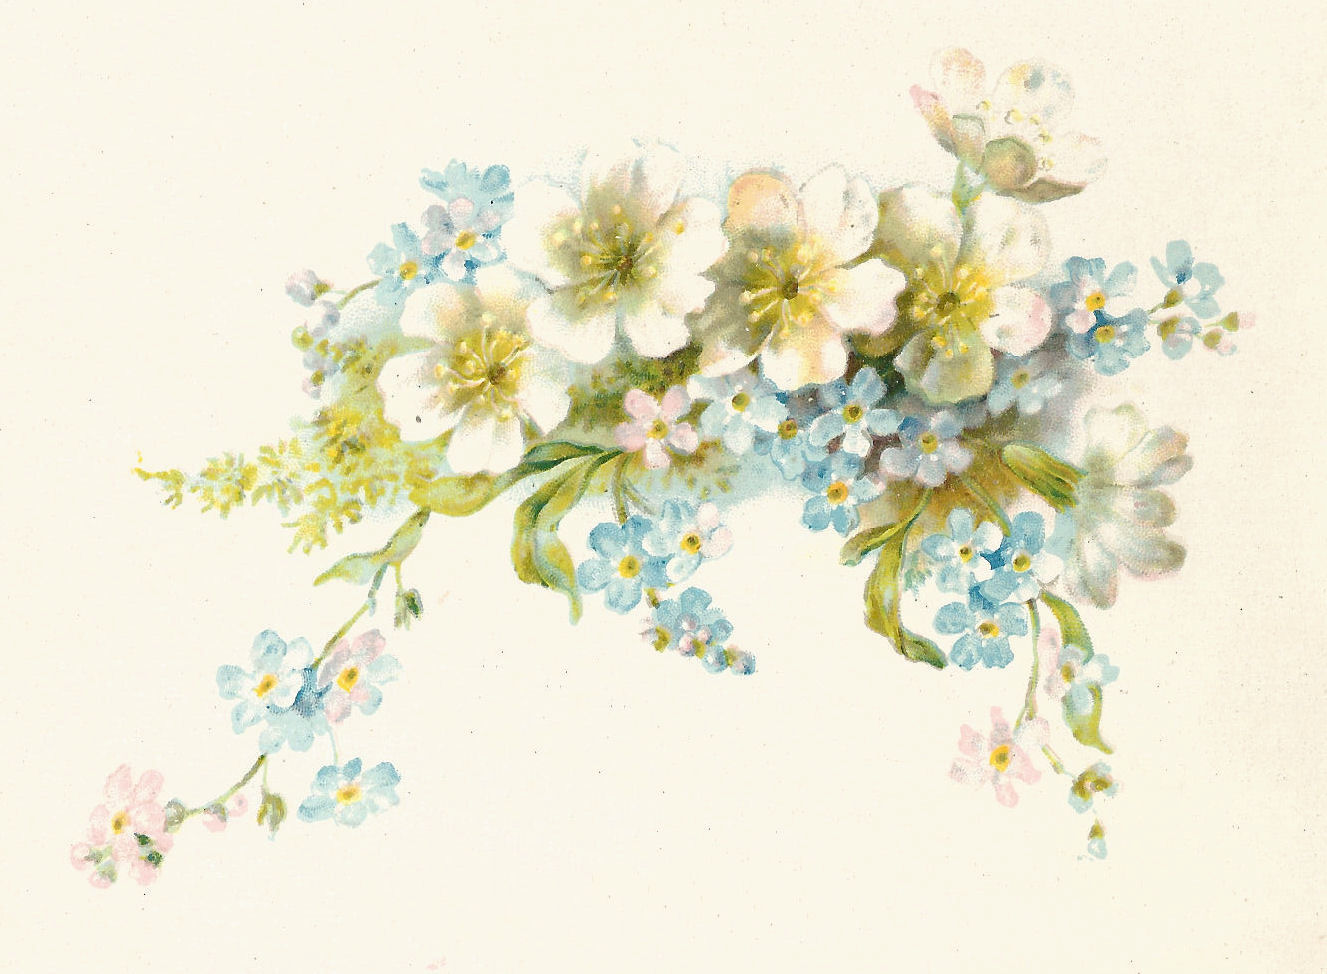 Antique Images Free Flower Graphic Vintage Illustration Of White